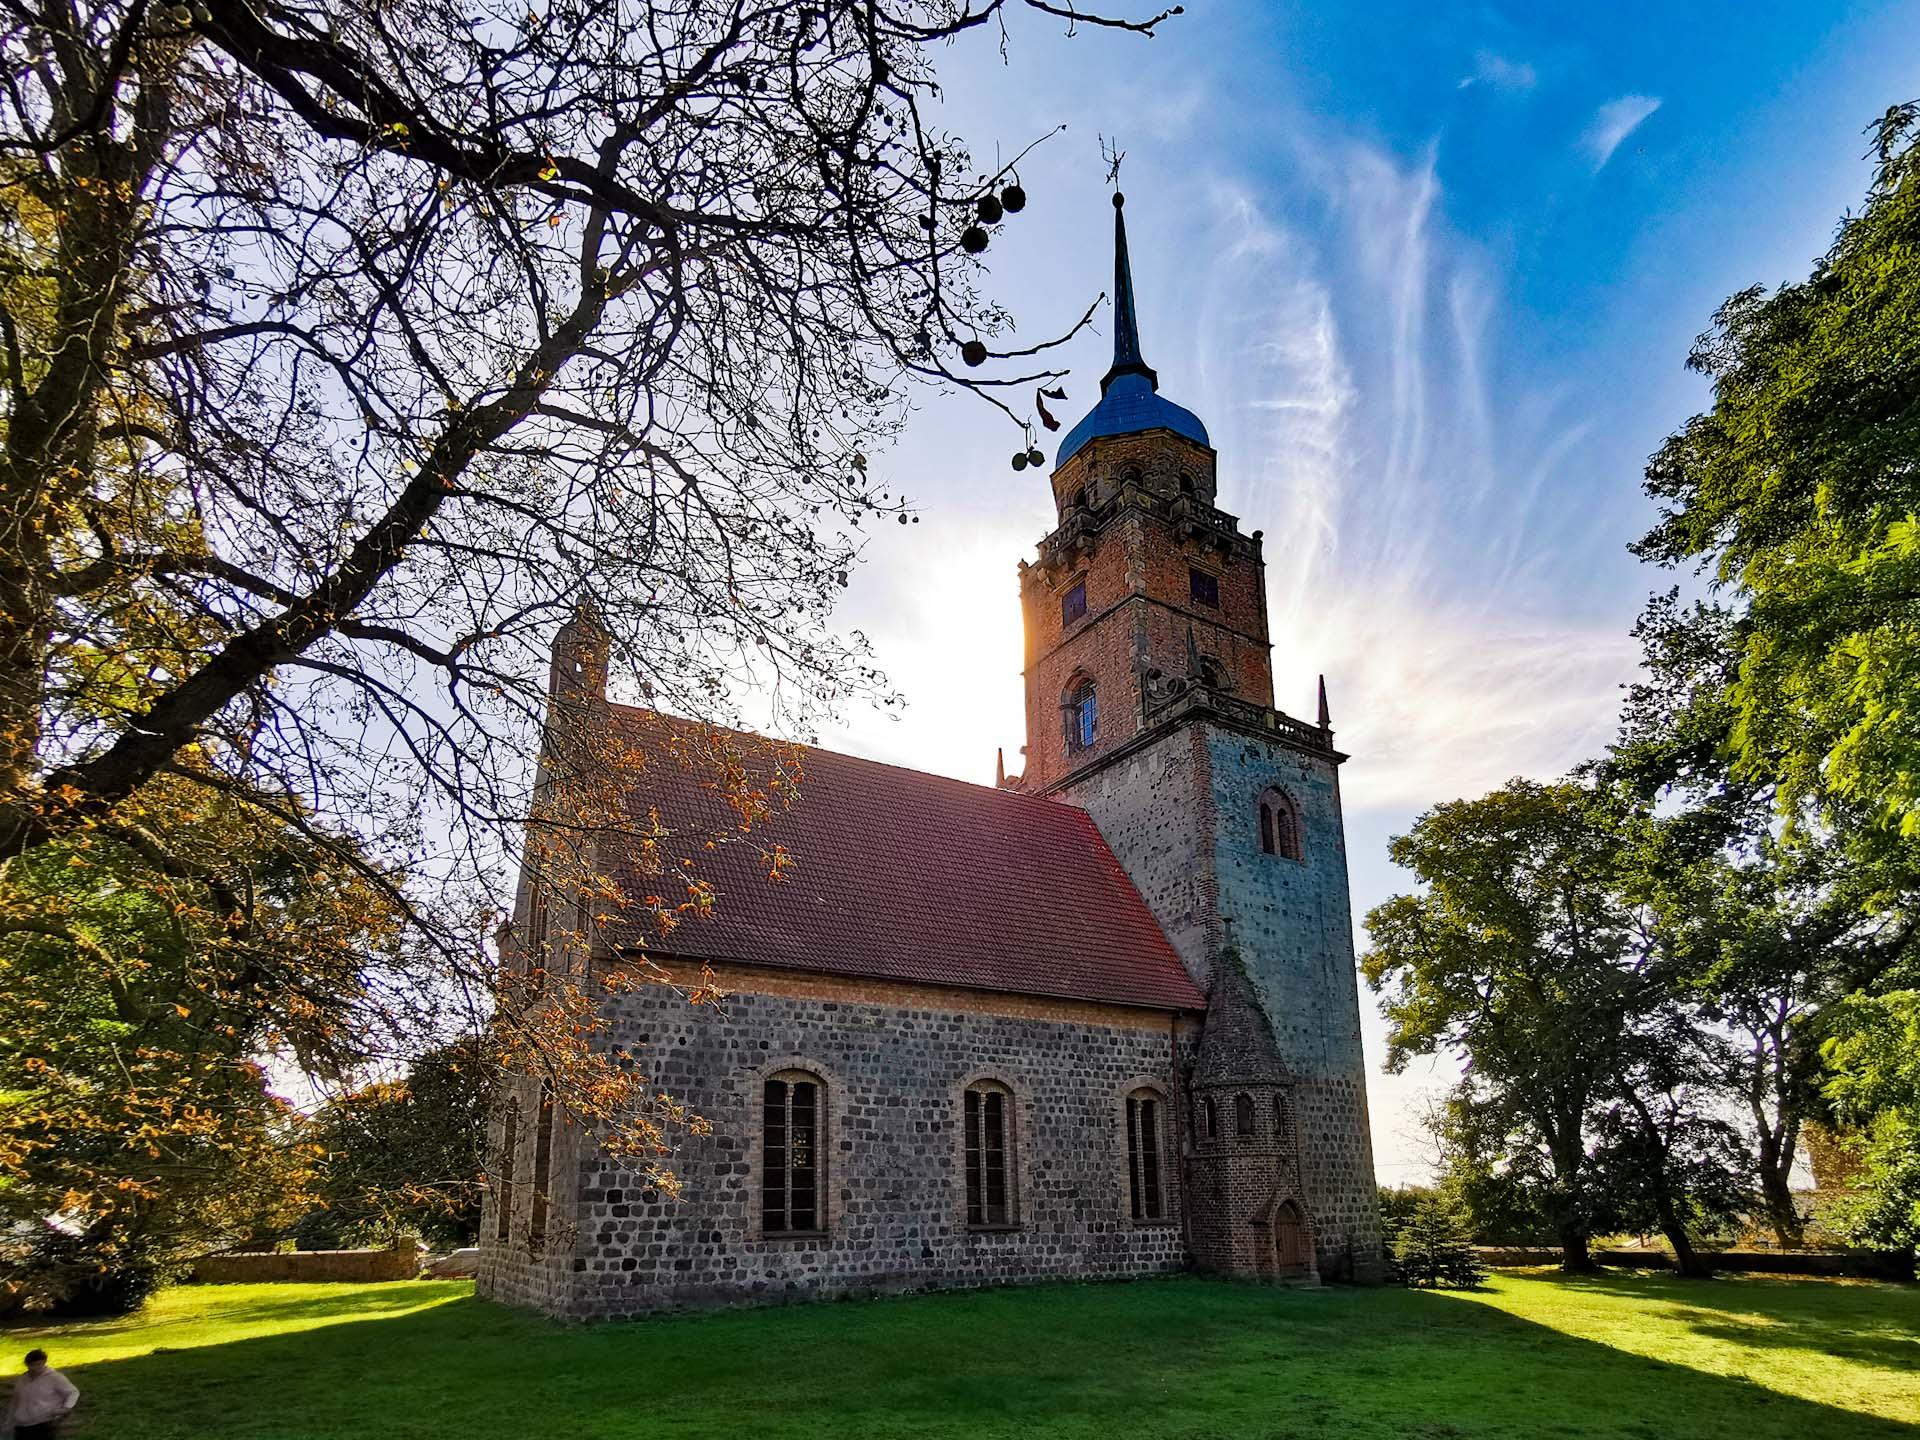 Kirche Hl. Joseph Lubiechów Górny